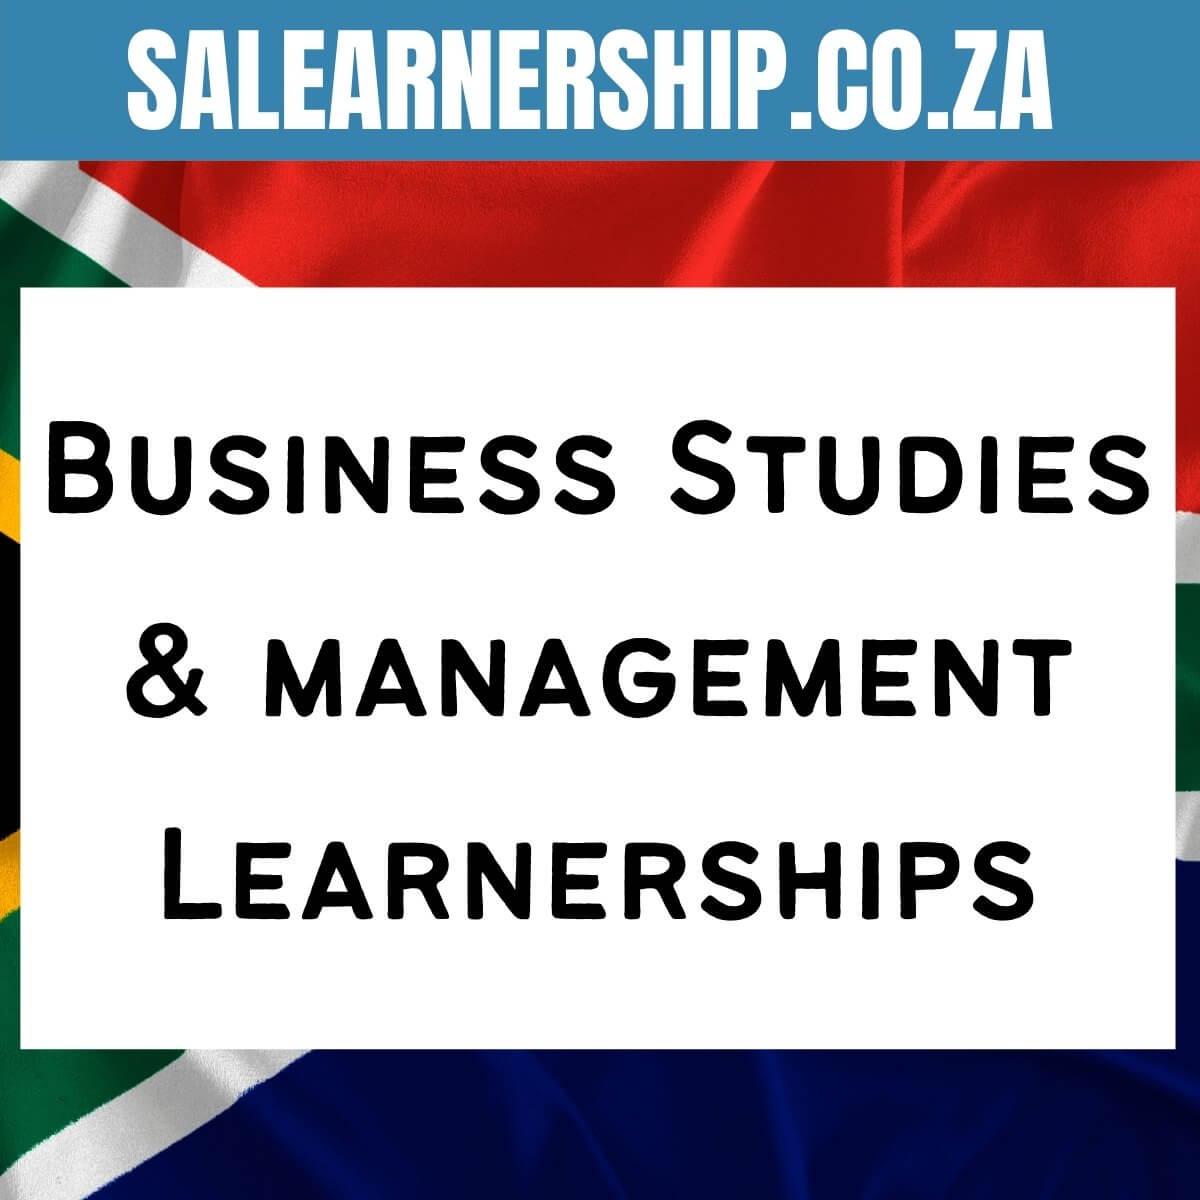 Business Studies & management Learnerships